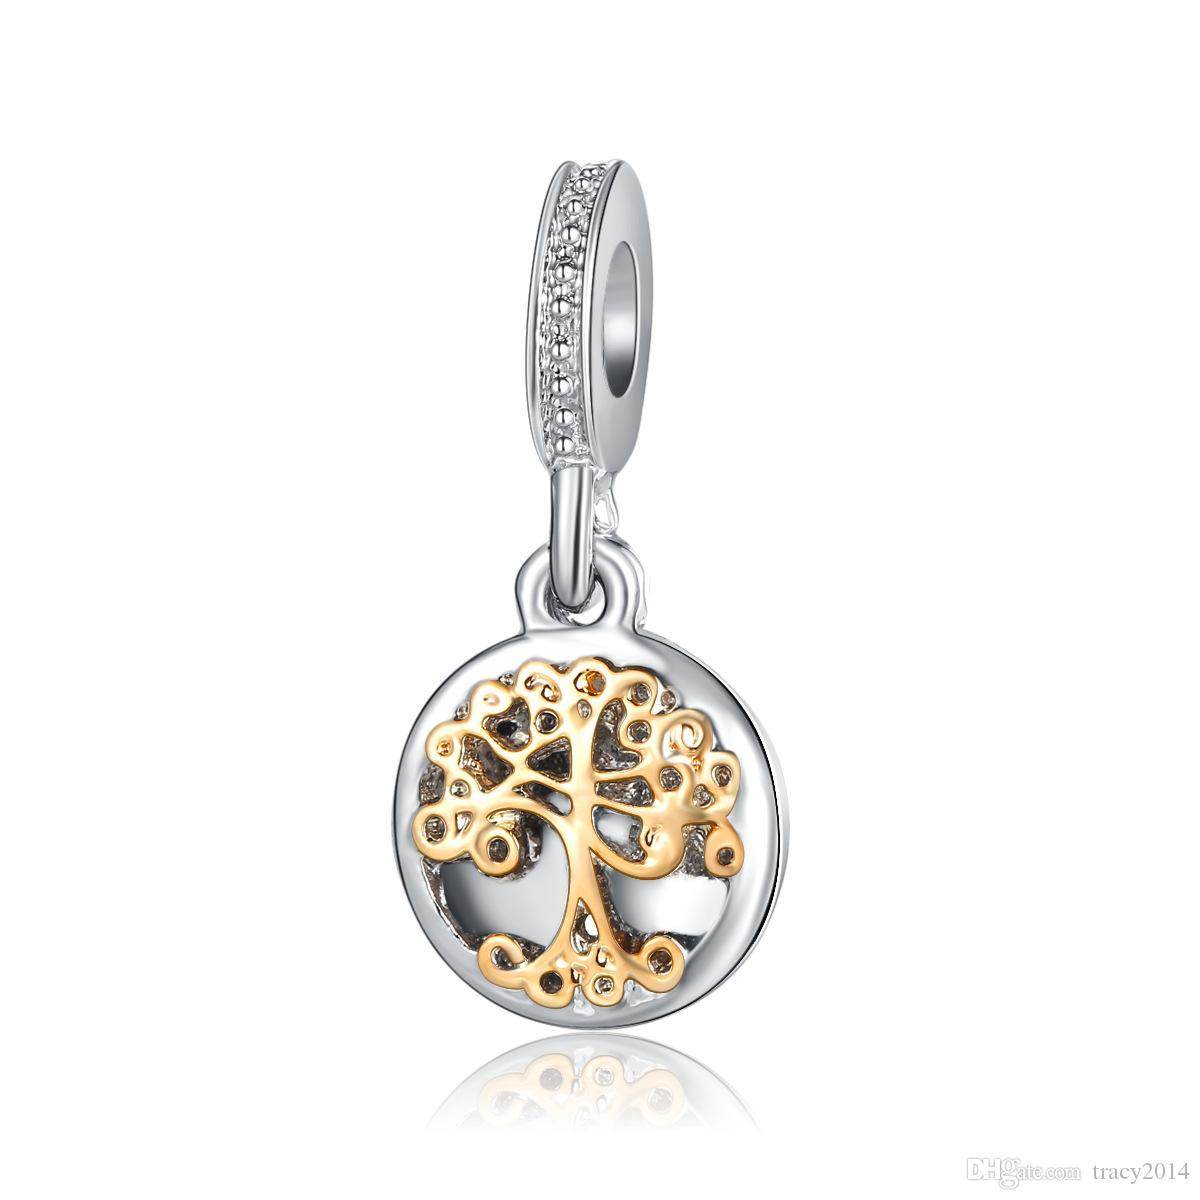 2021 Gold Life Tree Pendants Fits Pandora Bracelets Charm Beads Pendant Beads Big Hole Women Wedding Charm For Charm Chain Bracelets Necklaces From Tracy2014 0 45 Dhgate Com